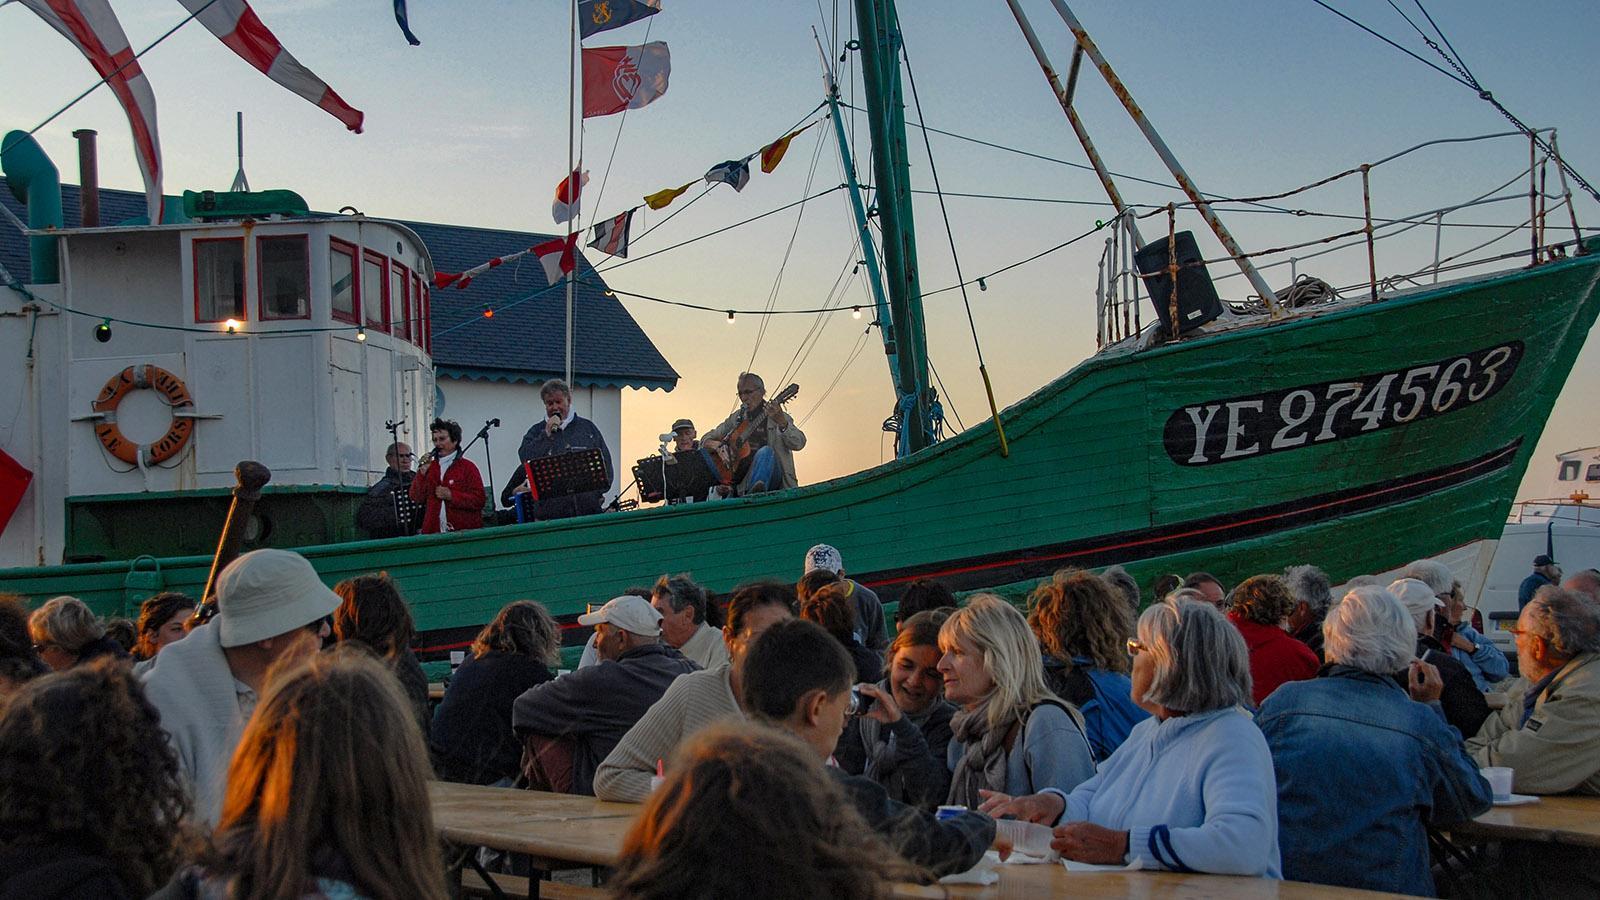 F/Vendée/Île d'Yeu: Port-Joinville, abends am Hafen. Foto: Hilke Maunder